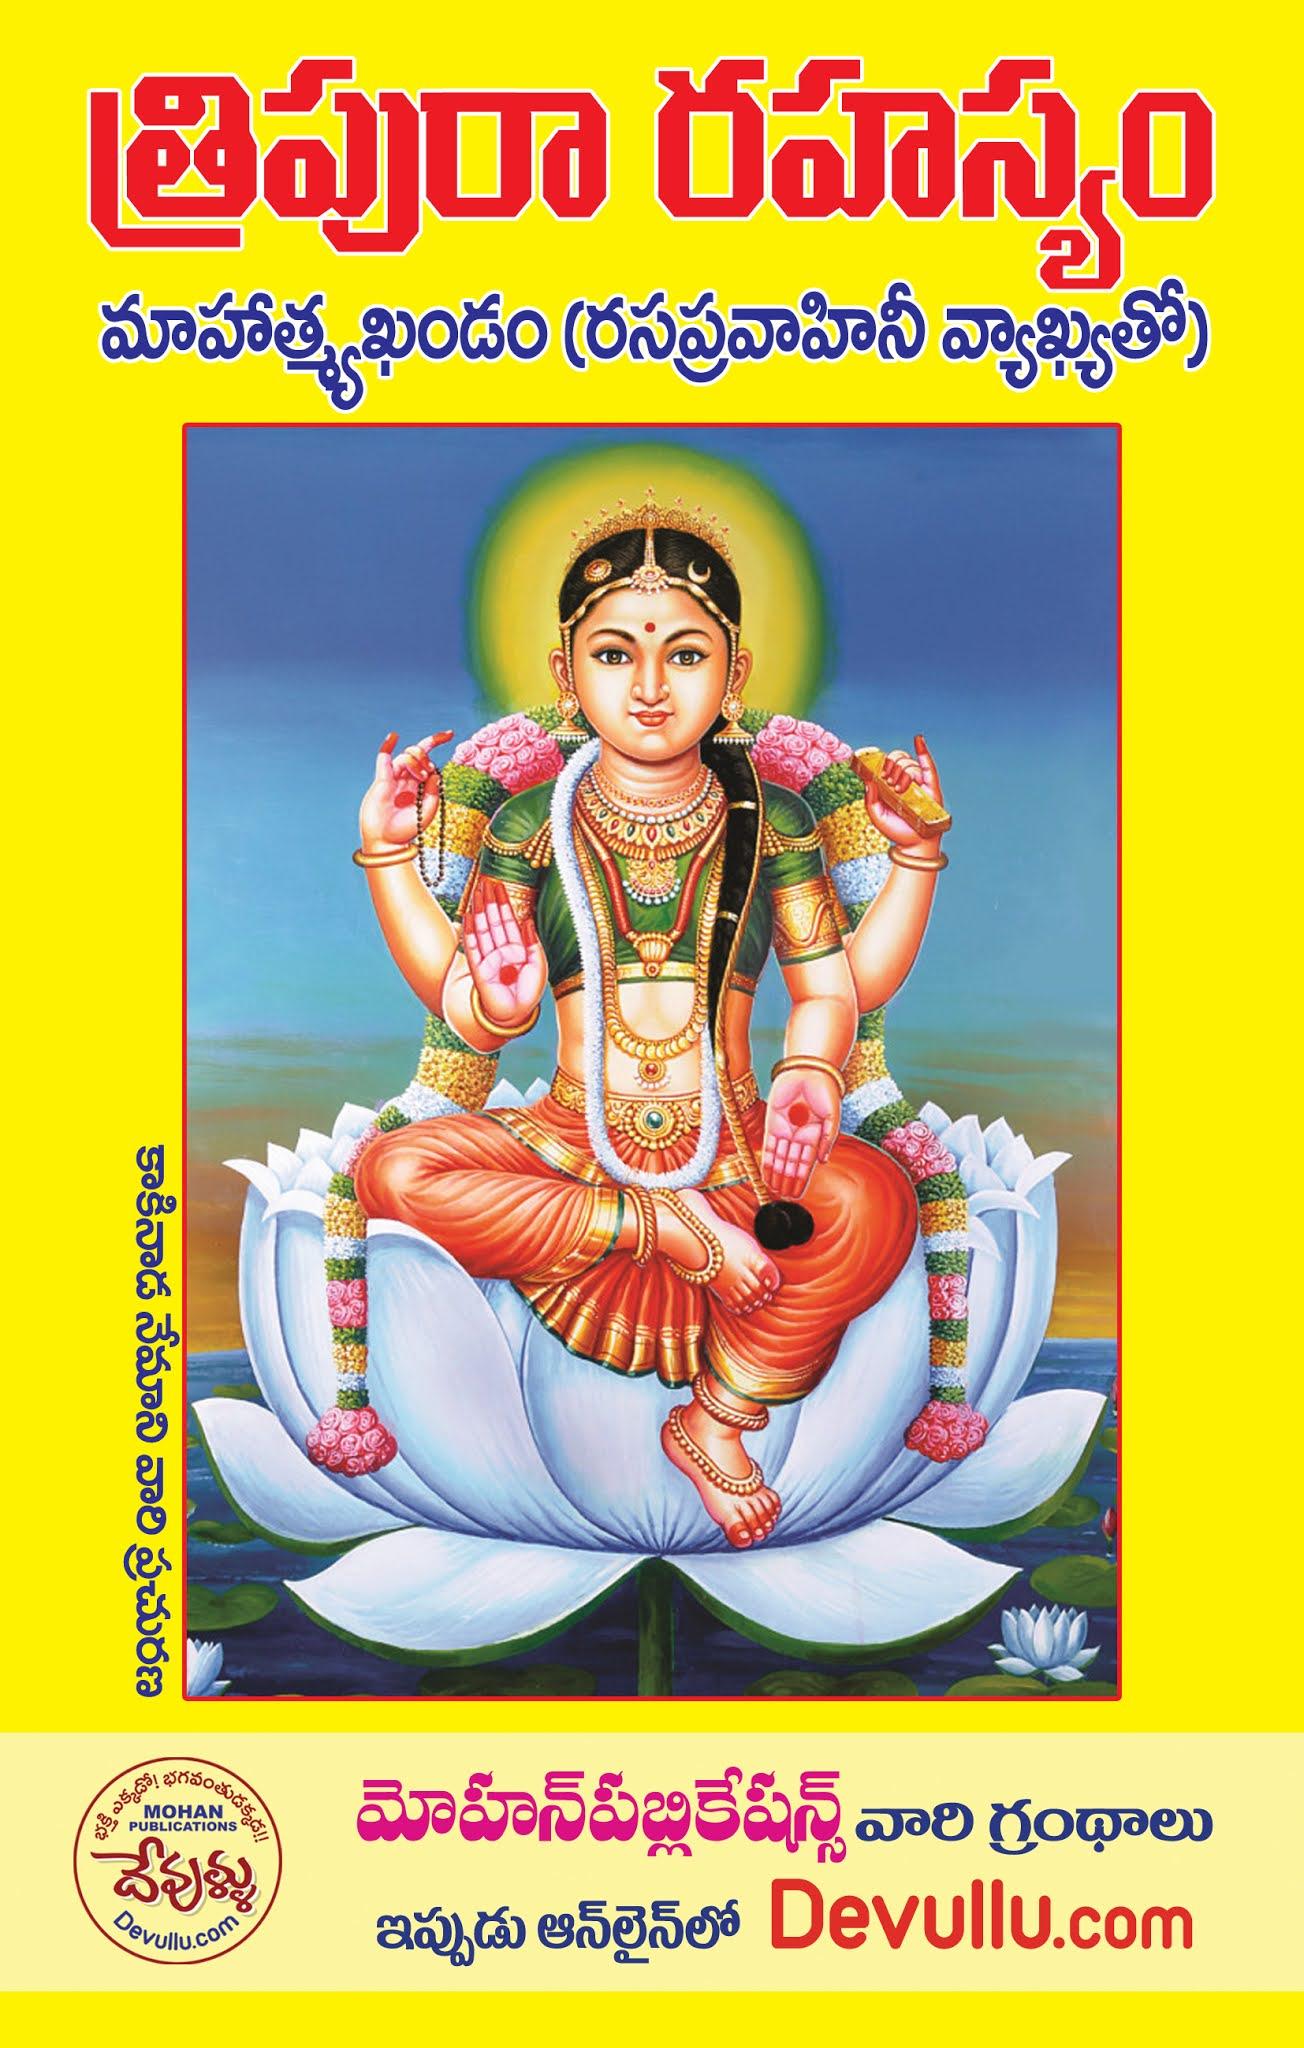 Tripura Rahasyam - By Rani Subbaiah Sastry | త్రిపురా రహస్యం  మాహాత్మ్య ఖండం | Tripura Rahasyam ( Mahatmya Khandam)